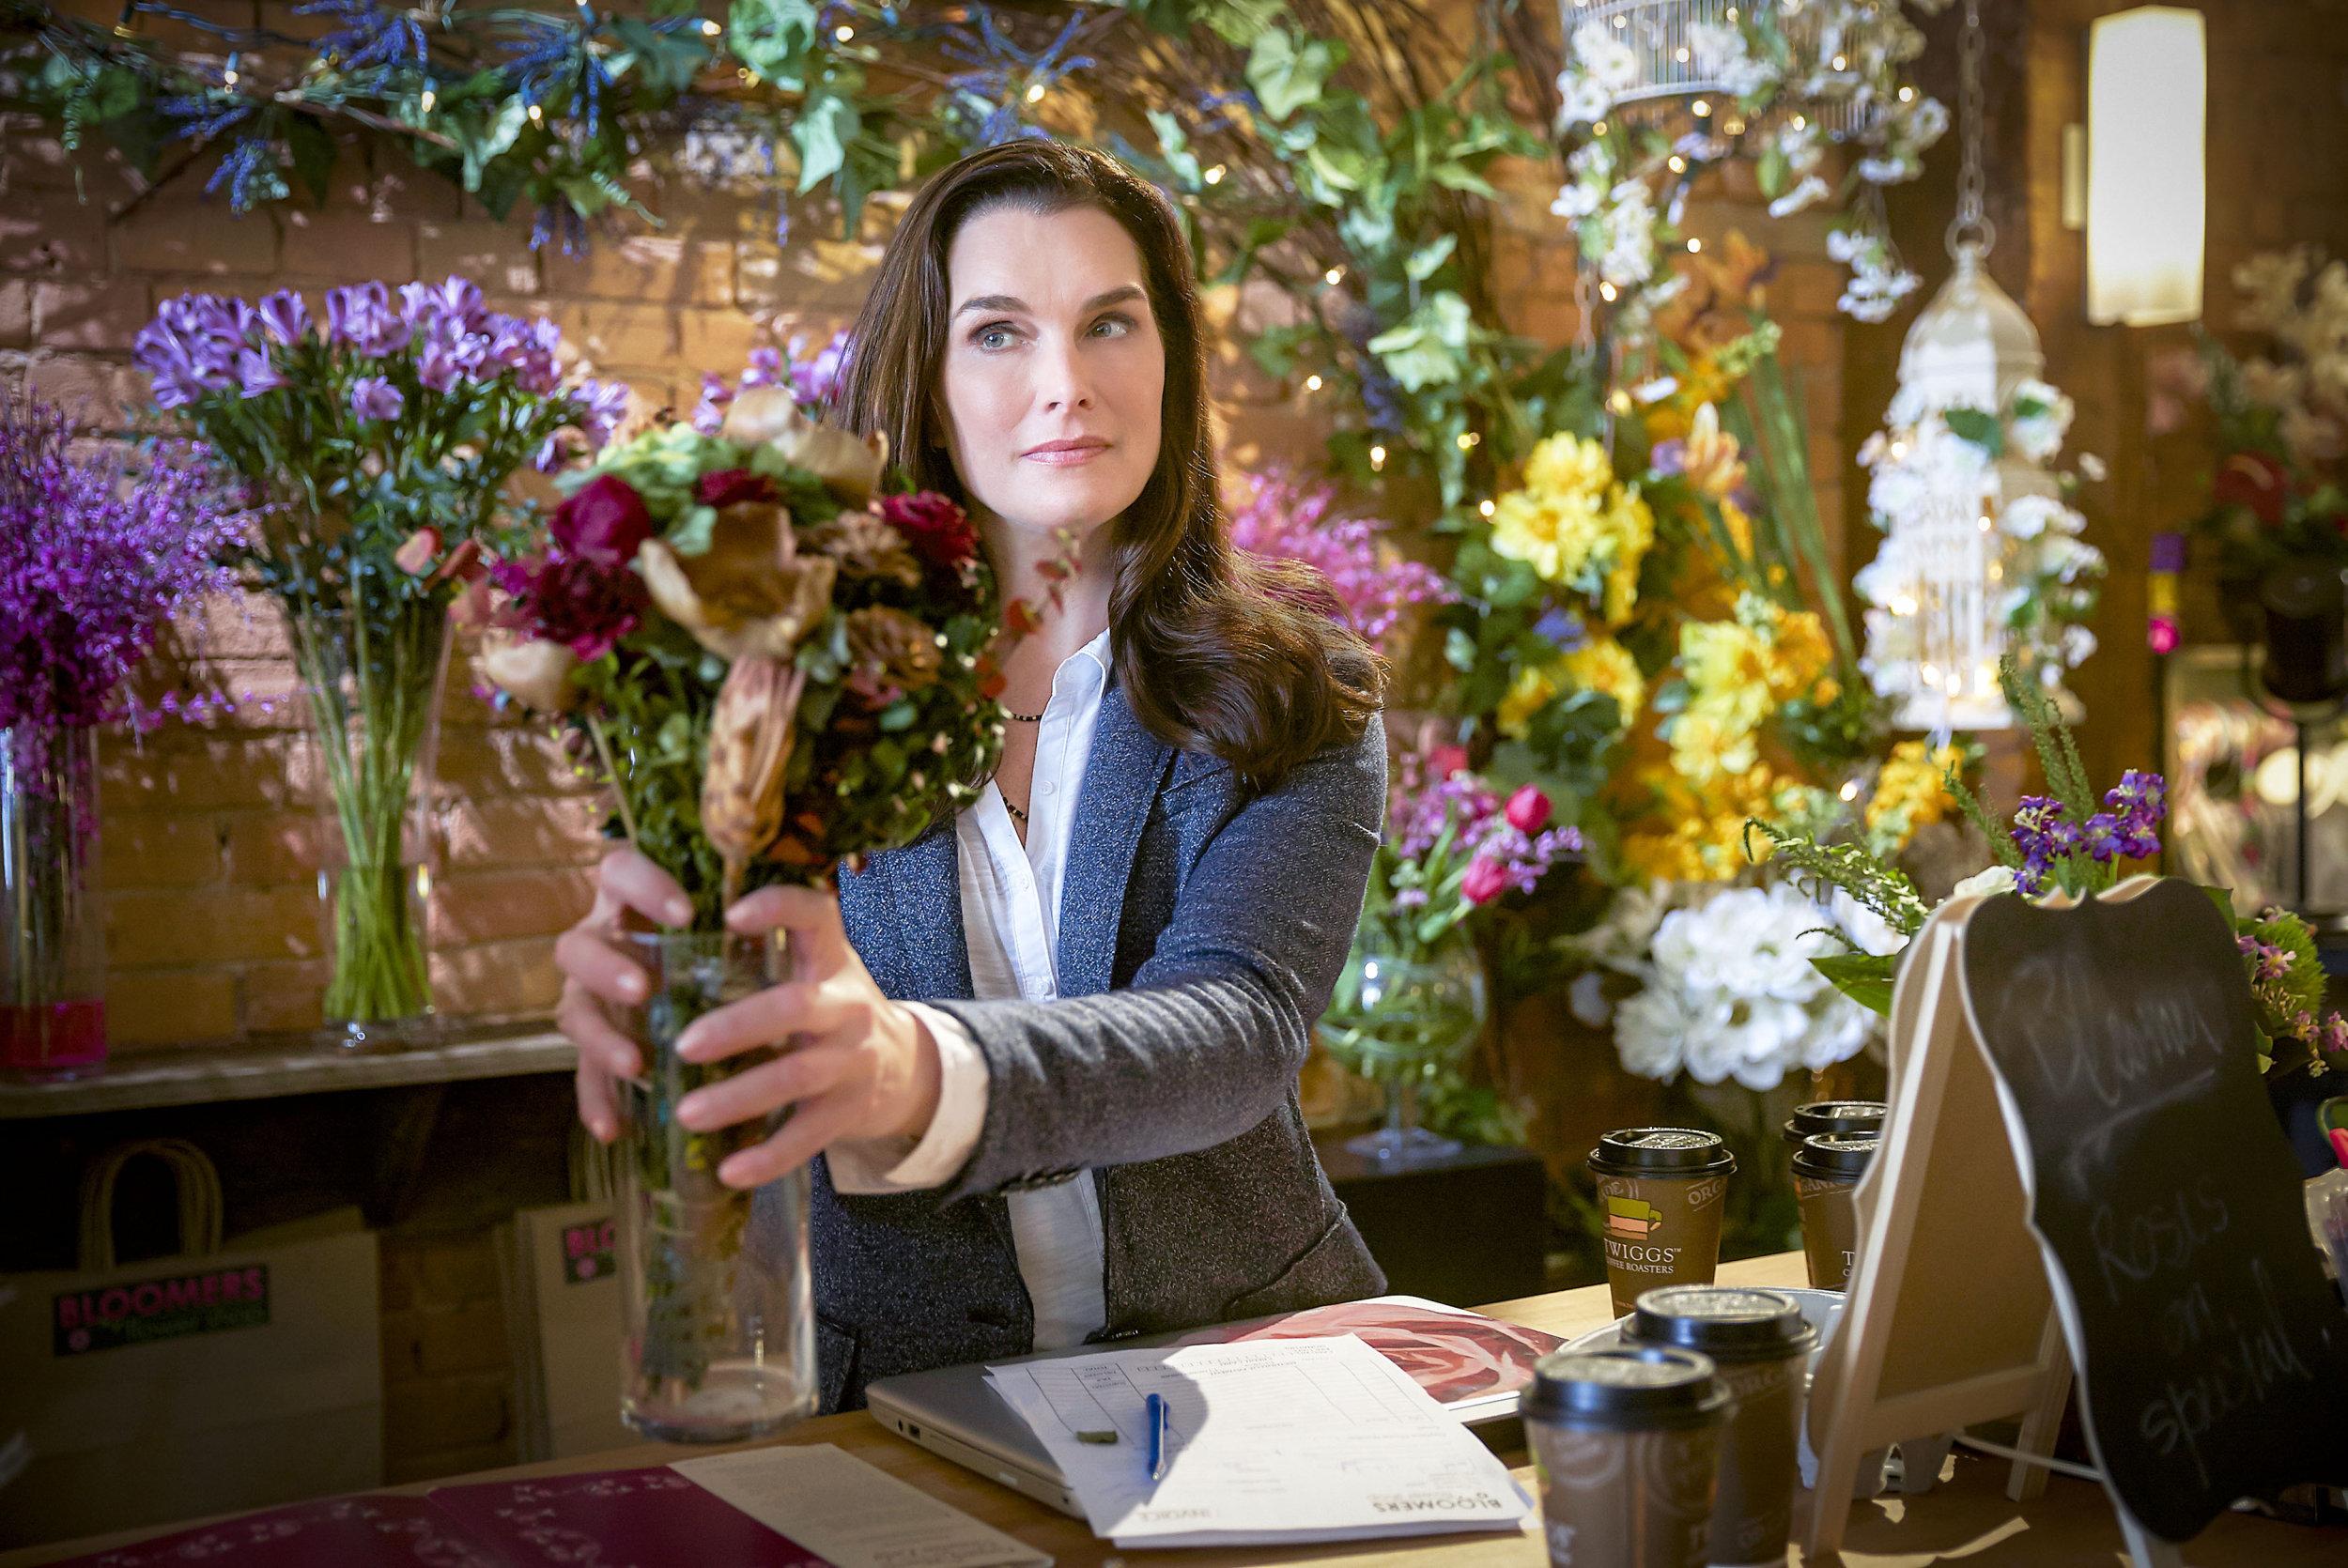 Flower shop mystery movies hallmark movies and mysteries izmirmasajfo Choice Image